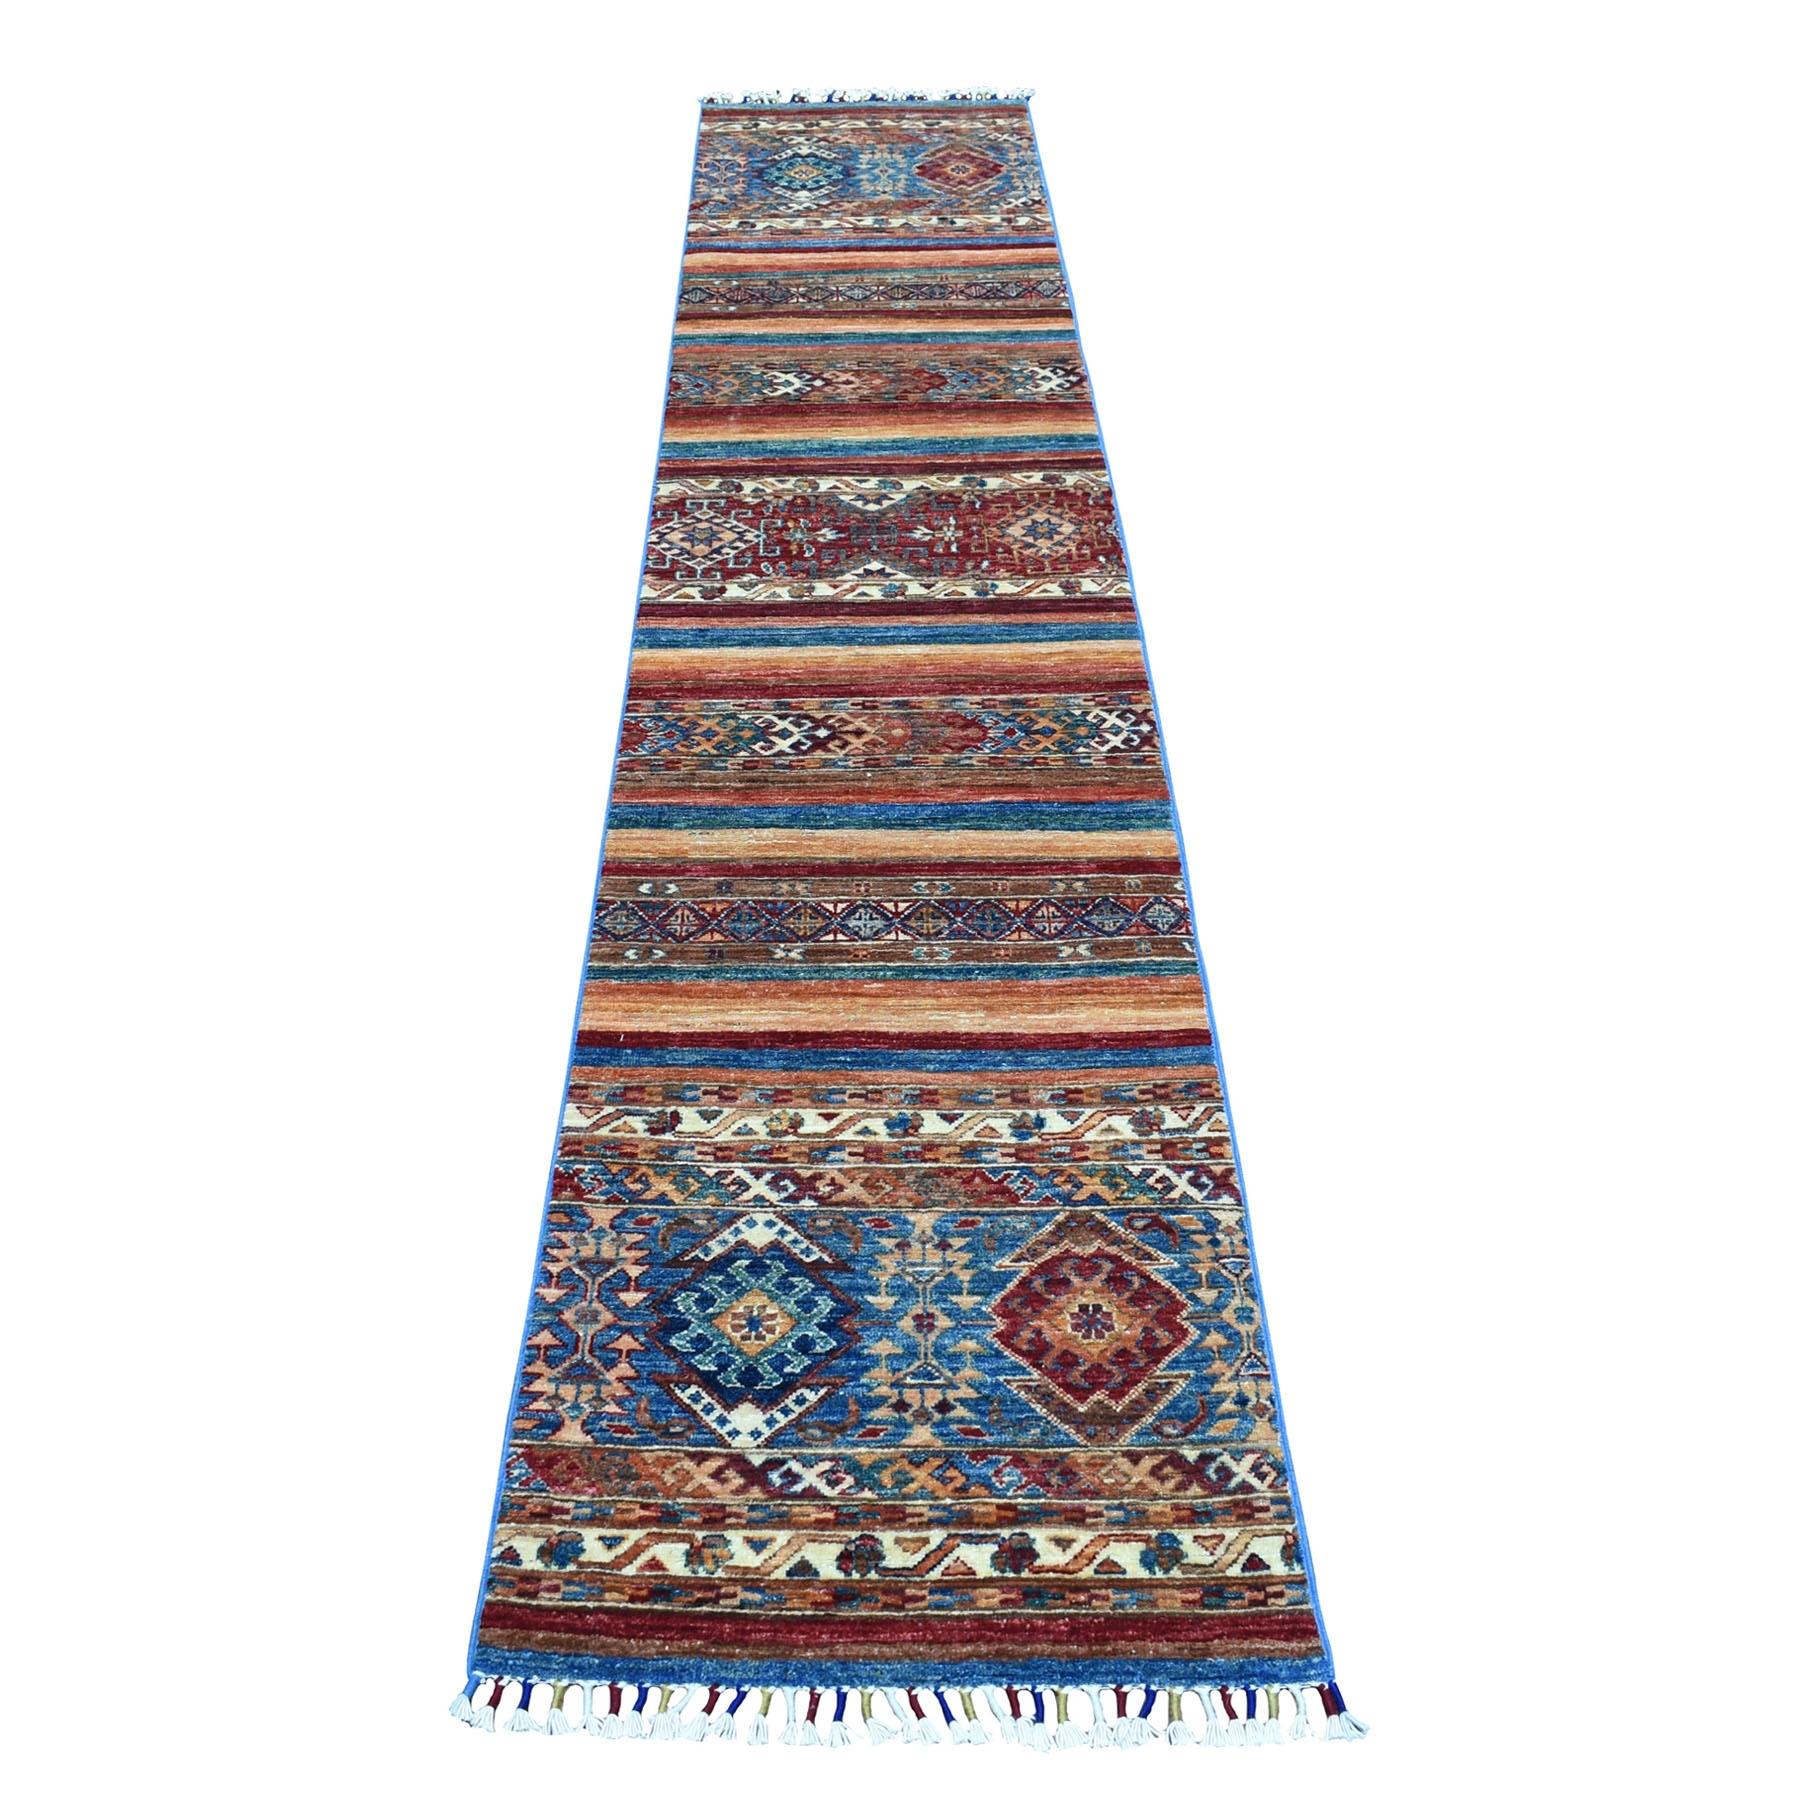 2'X10' Khorjin Design Runner Red Super Kazak Tribal Hand Knotted Pure Wool Oriental Rug moaeb8e9